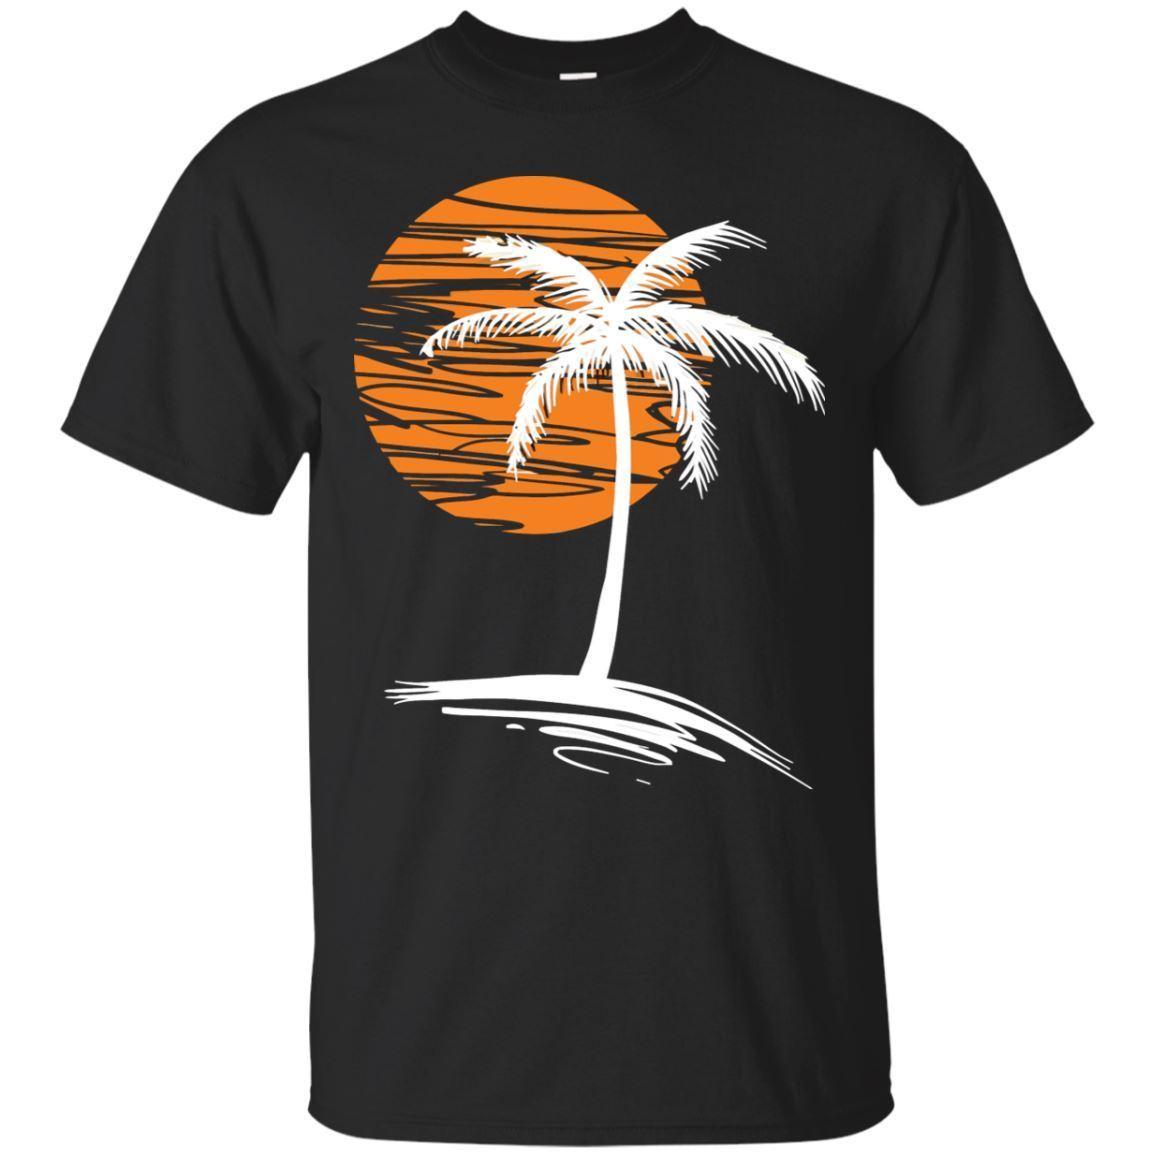 Palma puesta de sol árbol-Outrun Synthwave nuevo Retro Wave camiseta-negro, azul marino camiseta Cool Casual pride camiseta hombres Unisex moda